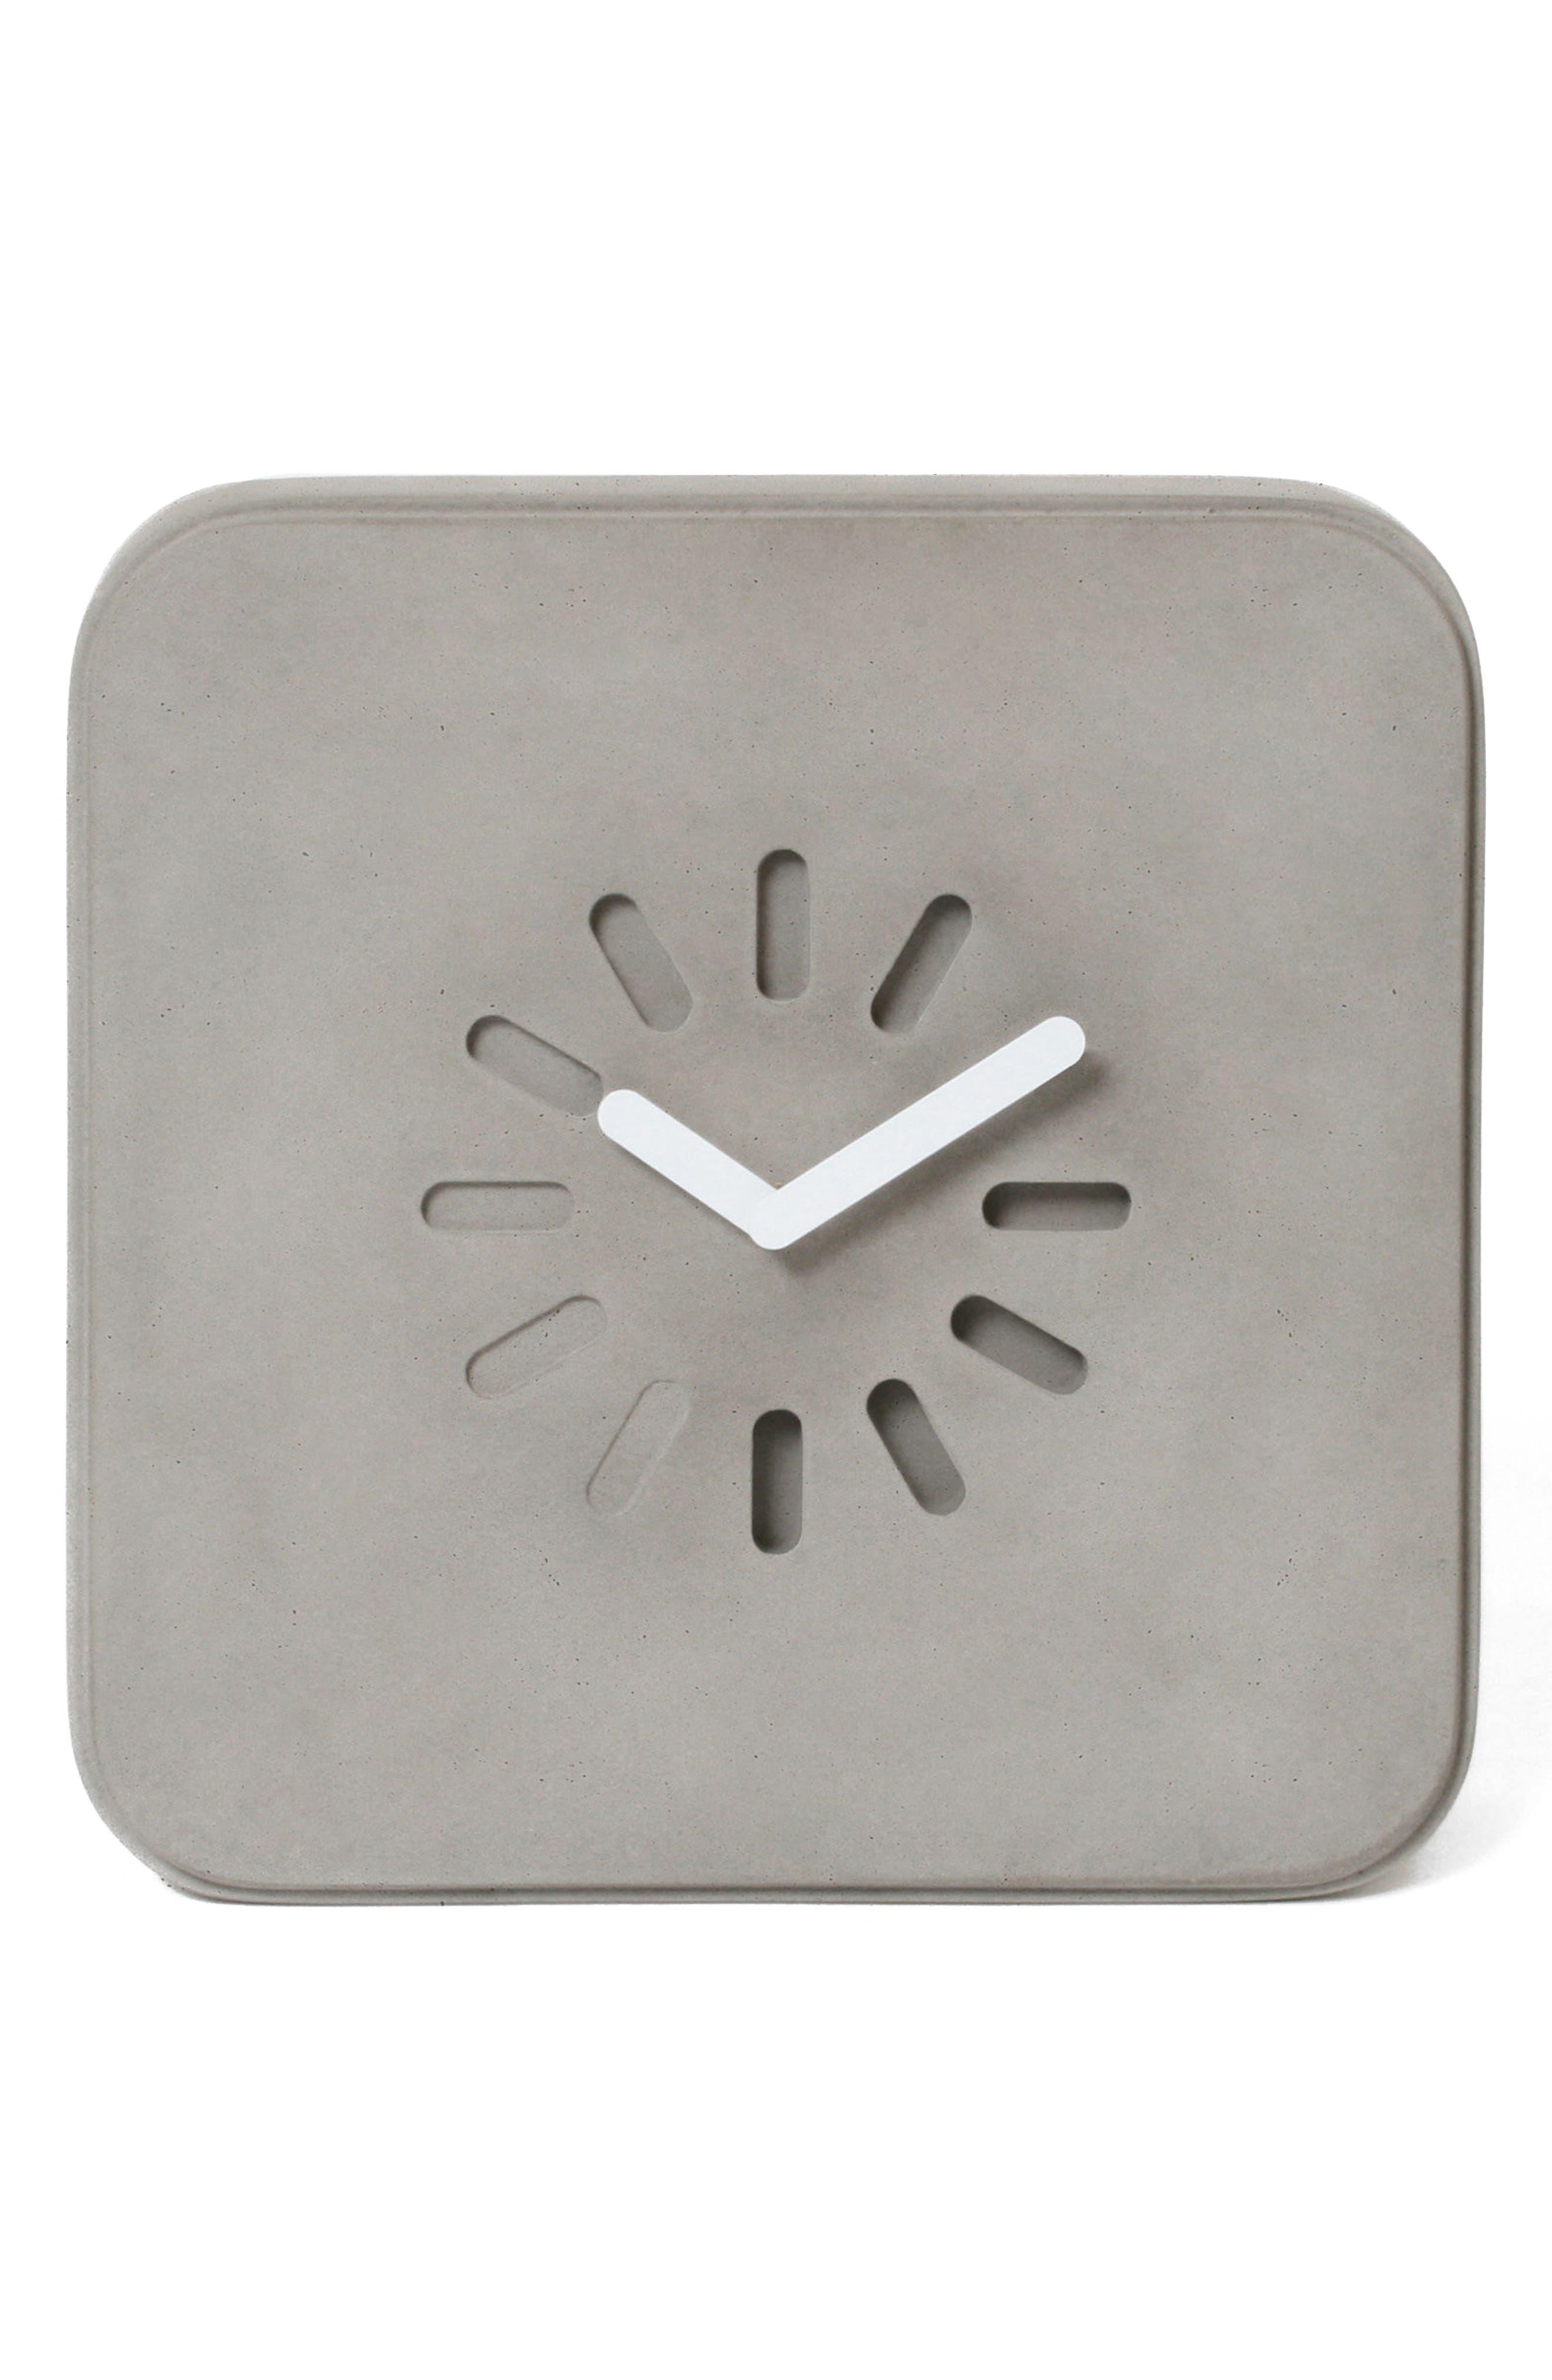 Lyon Béton Life in Progress Clock,                         Main,                         color,